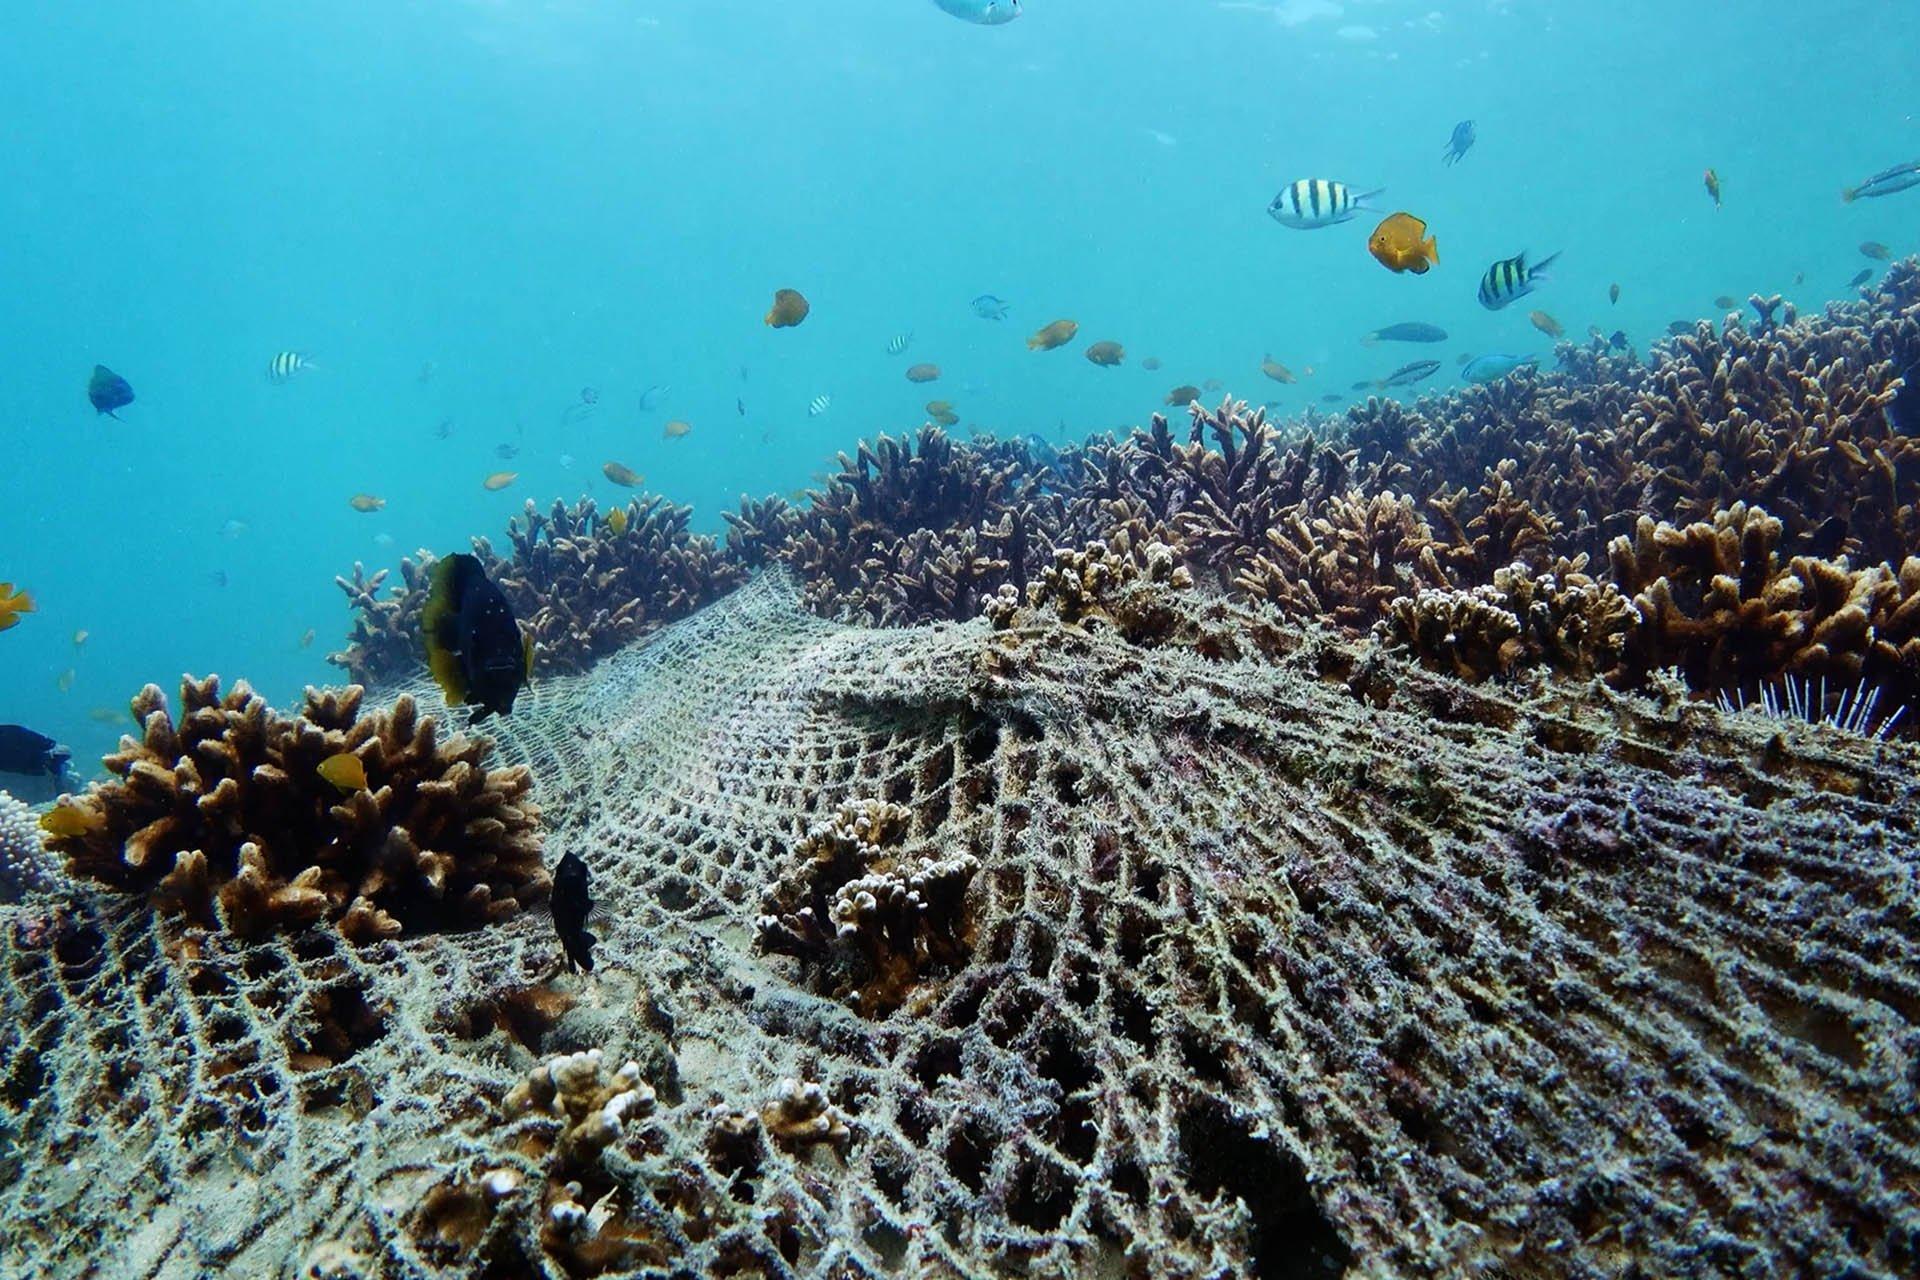 Prevent pollution with Bokashi Organko 2 Ocean